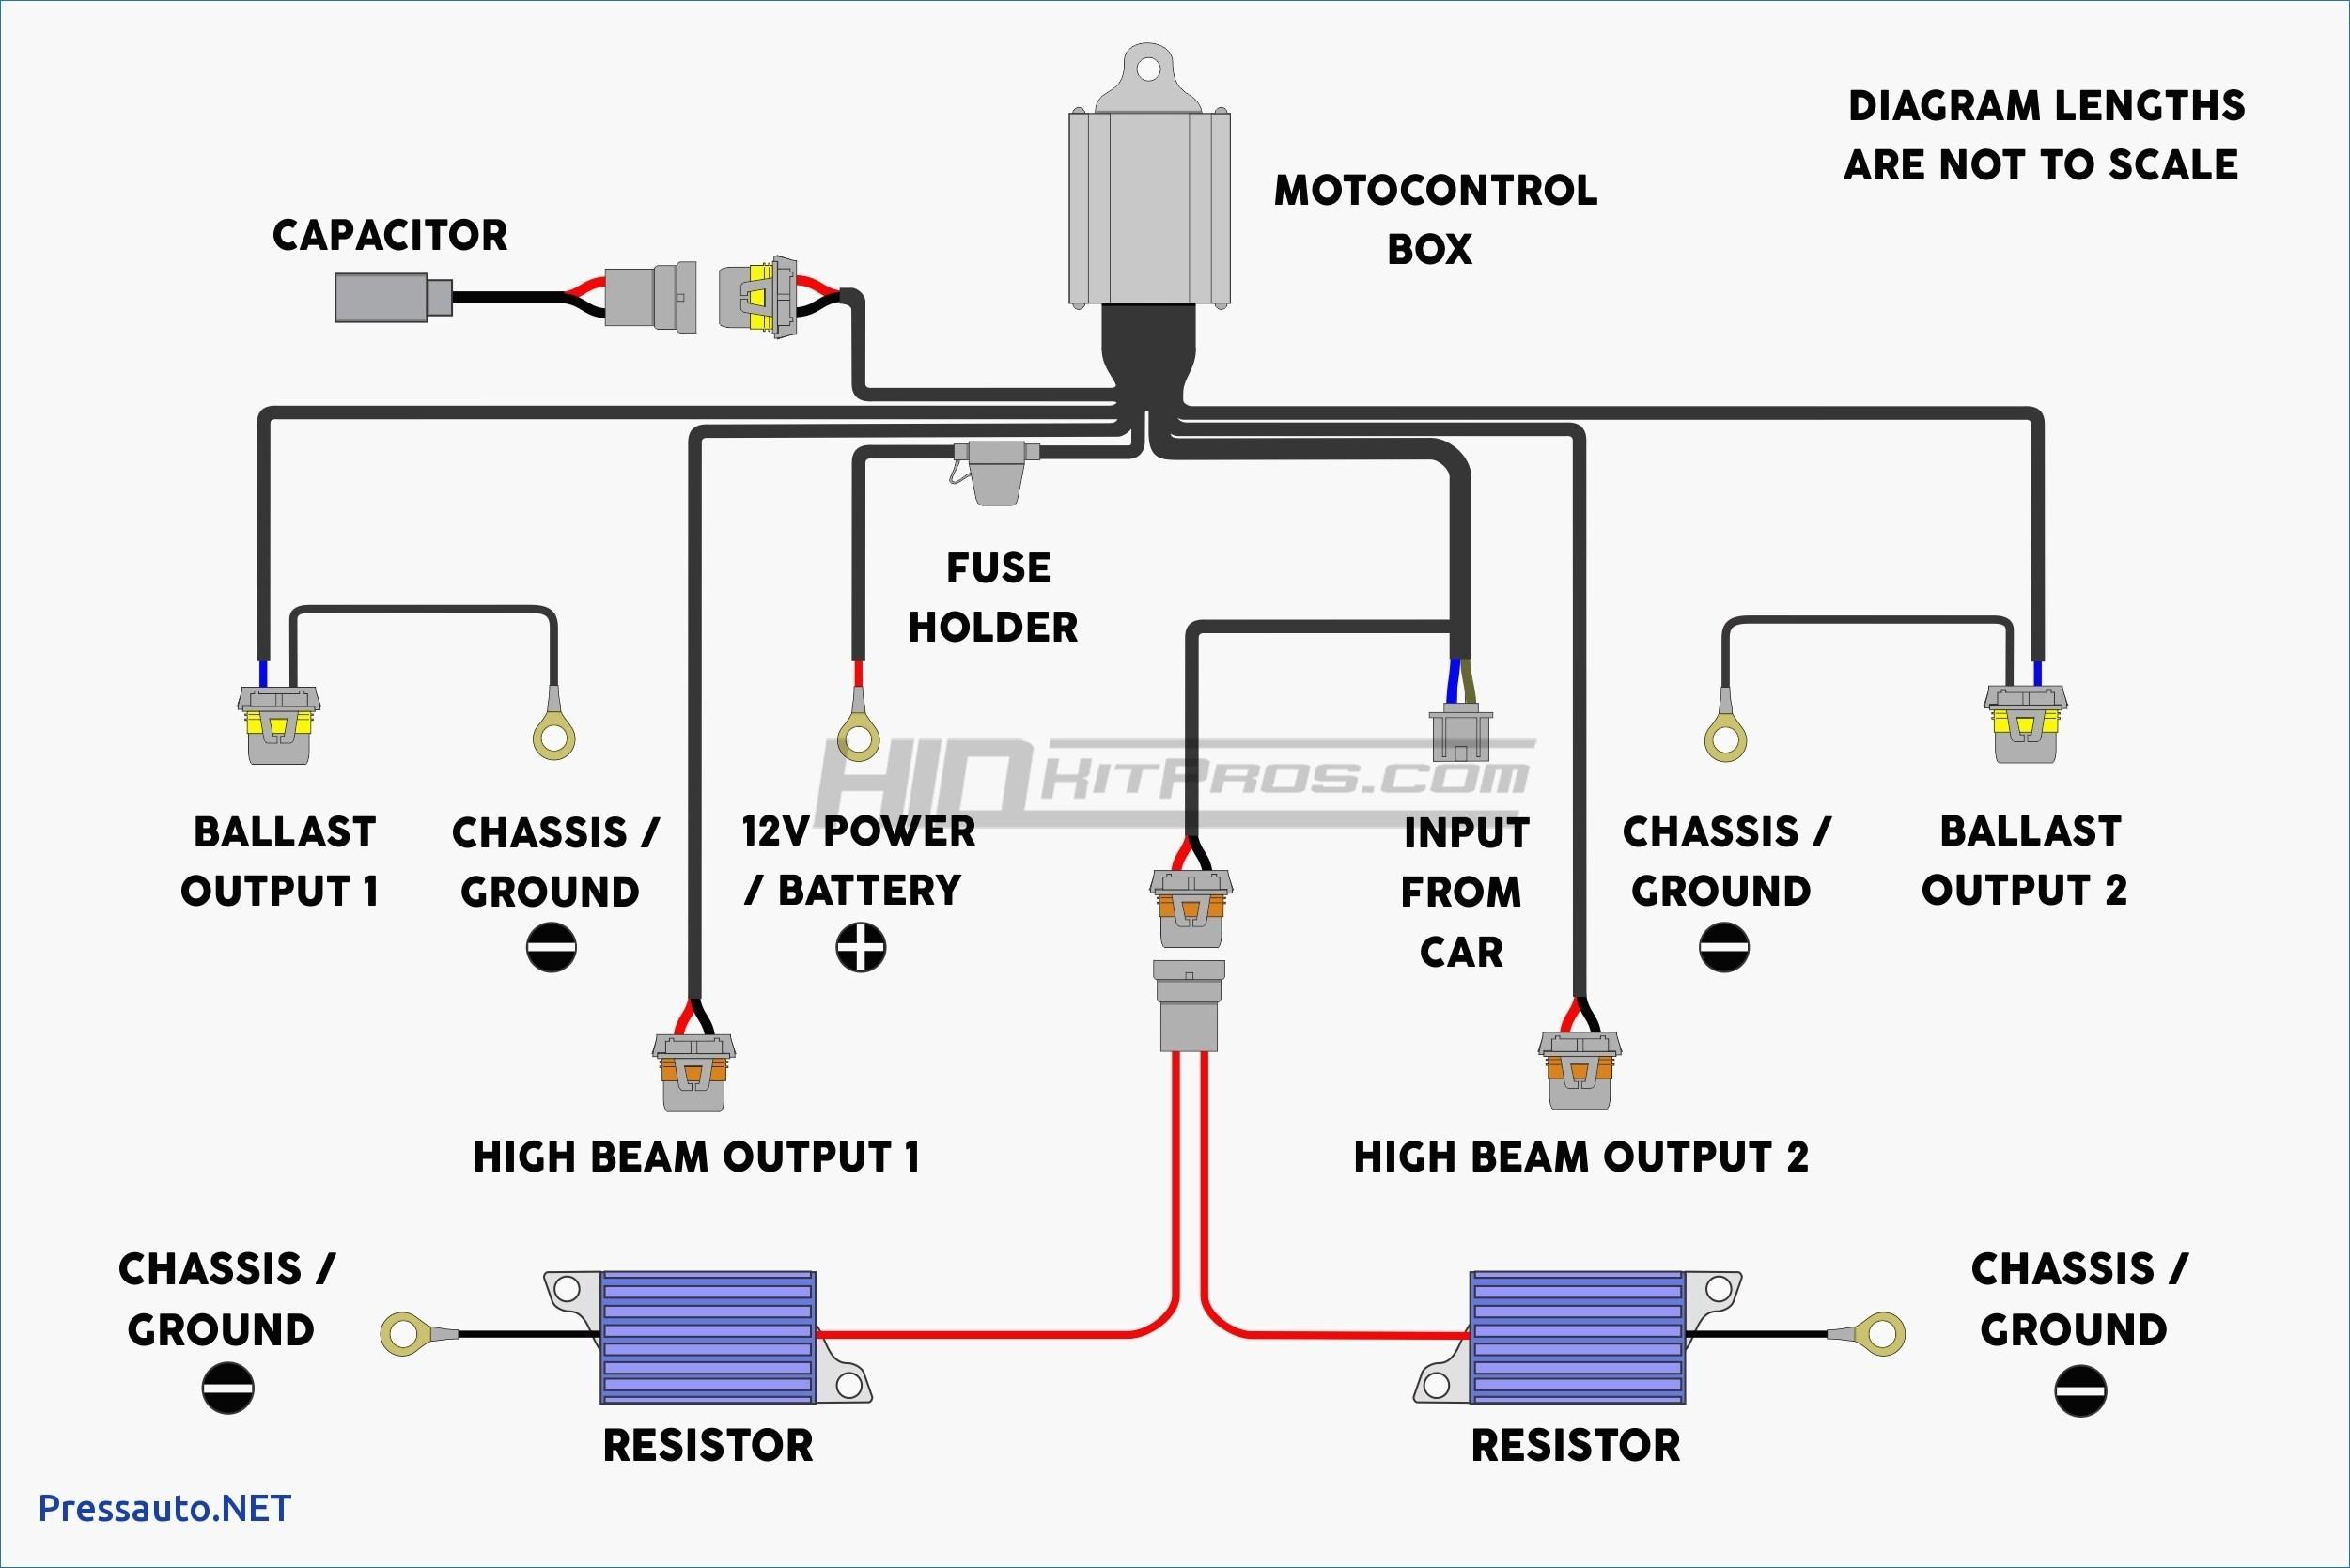 meyer snow plow headlight wiring diagram tecumseh recoil starter assembly 66 e 19 stromoeko de manual books rh 15 made4dogs meyers schematic